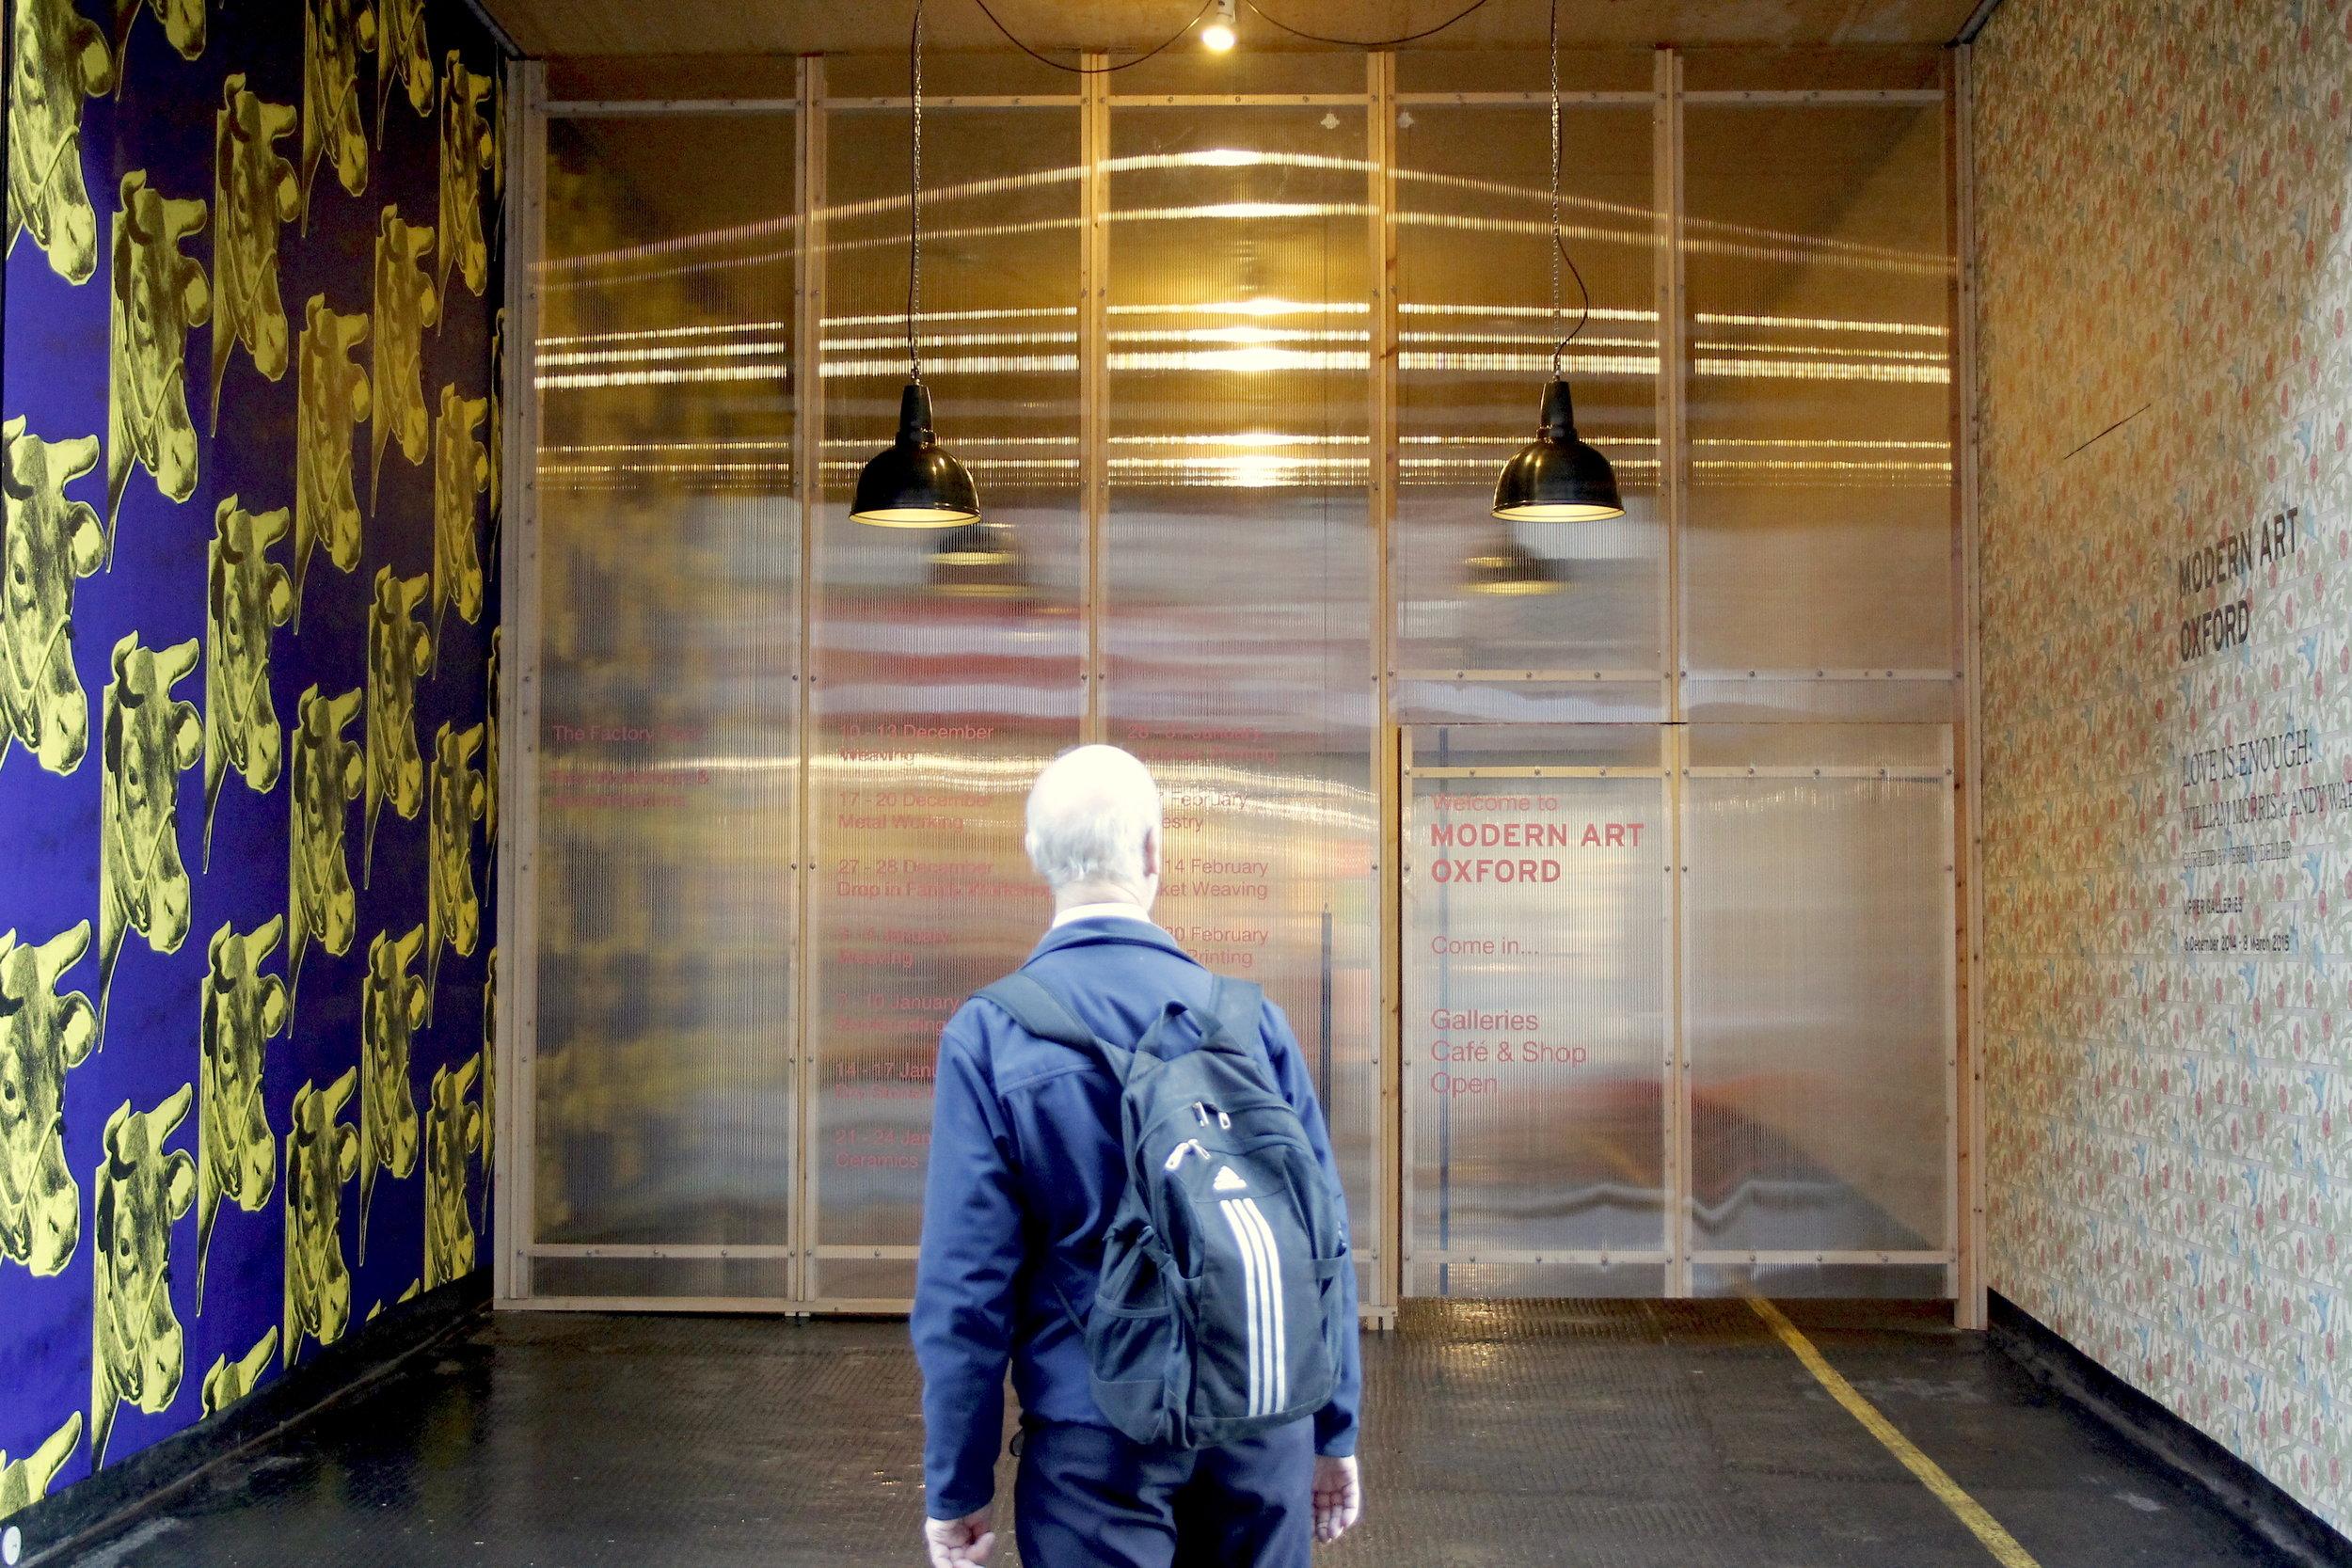 Kennedy Woods Architecture_Modern Art Oxford 1.JPG